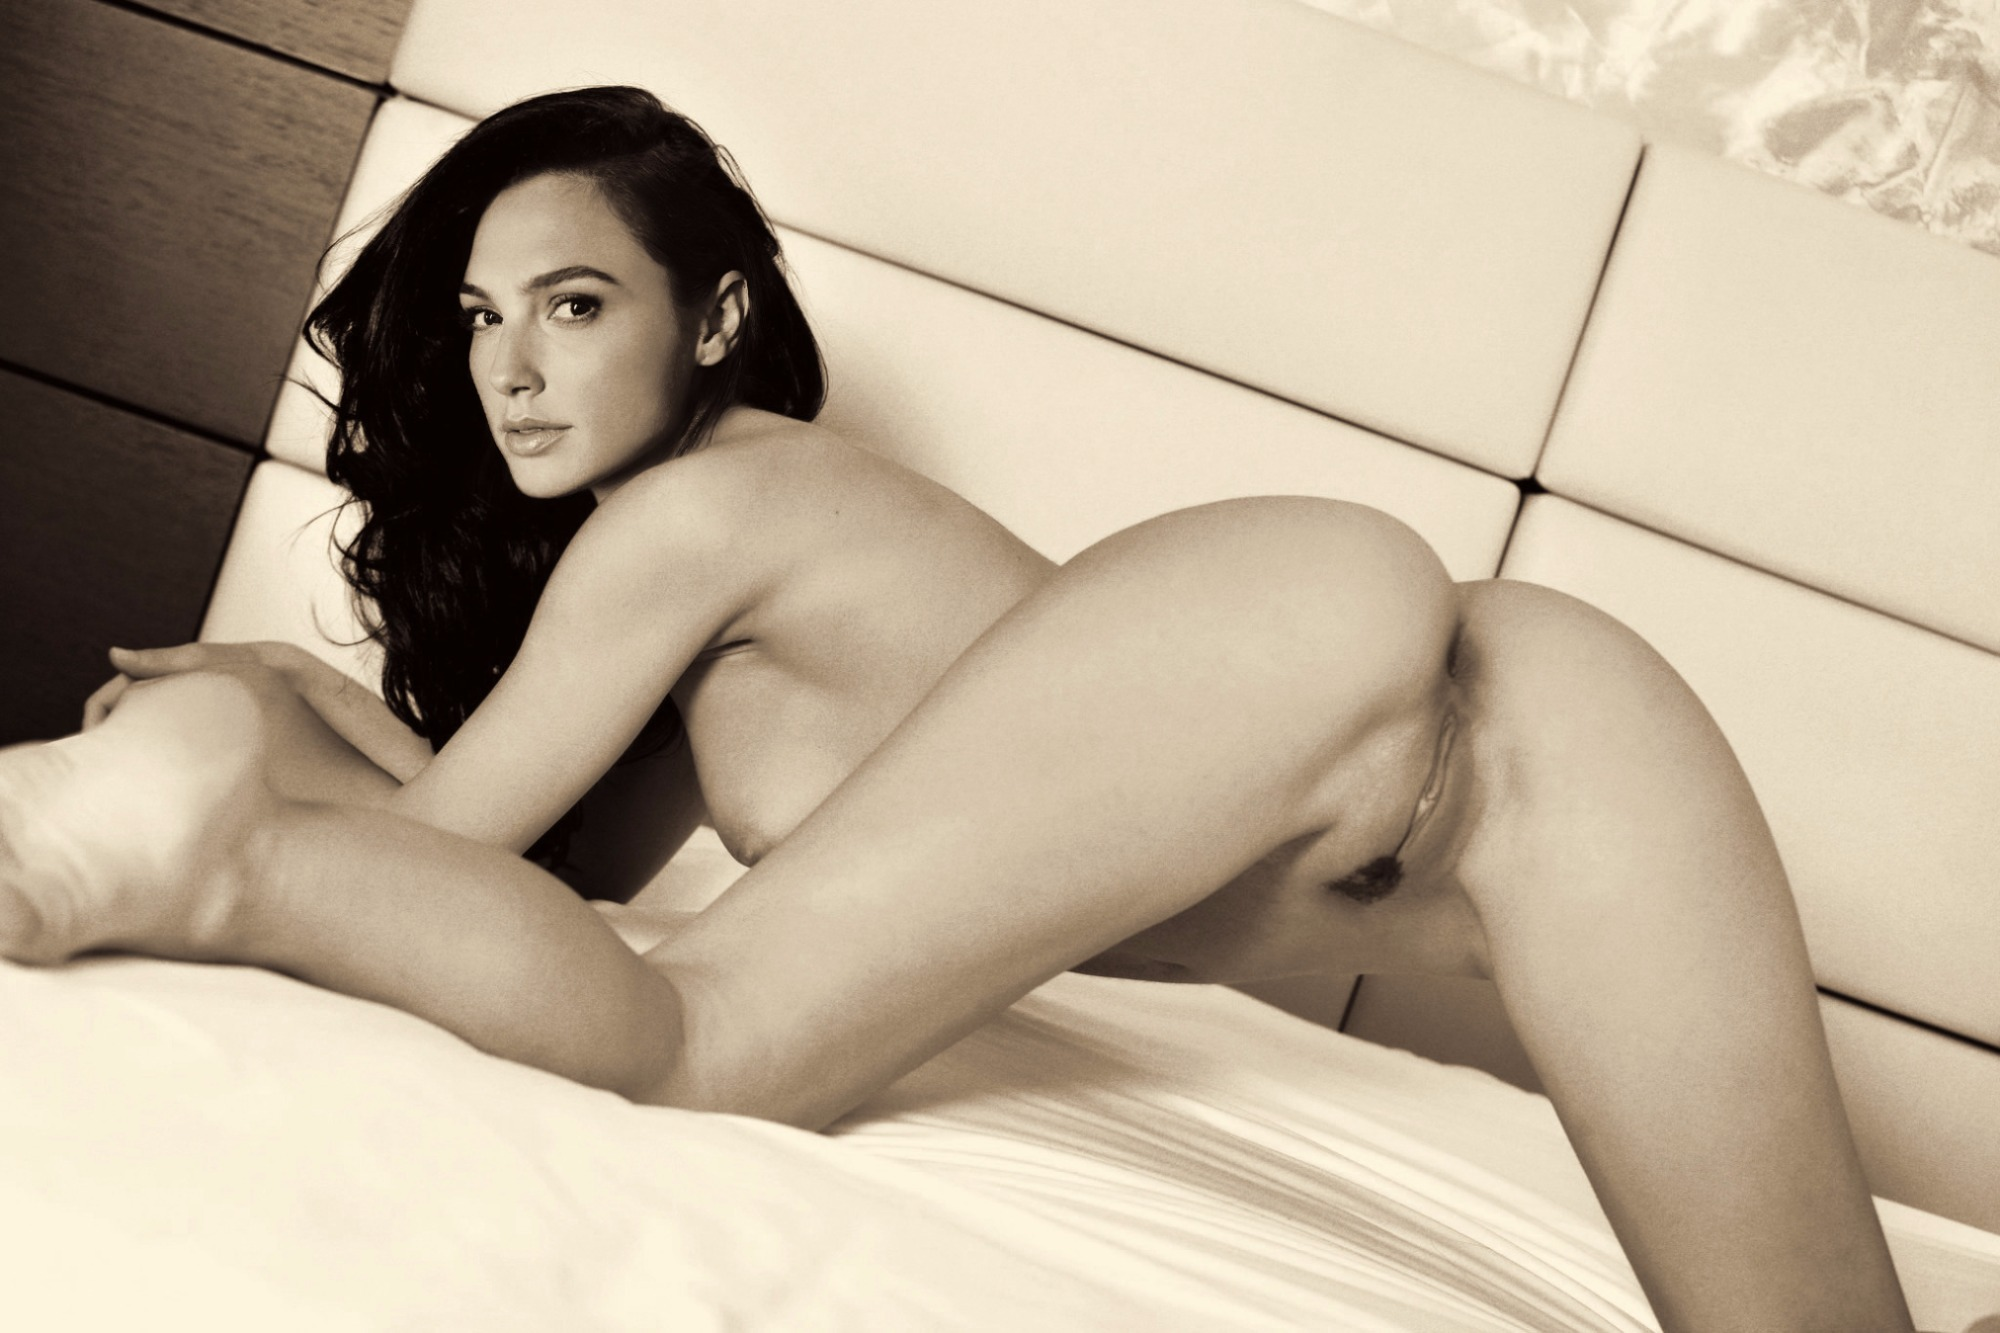 Erica mena nude with nylons